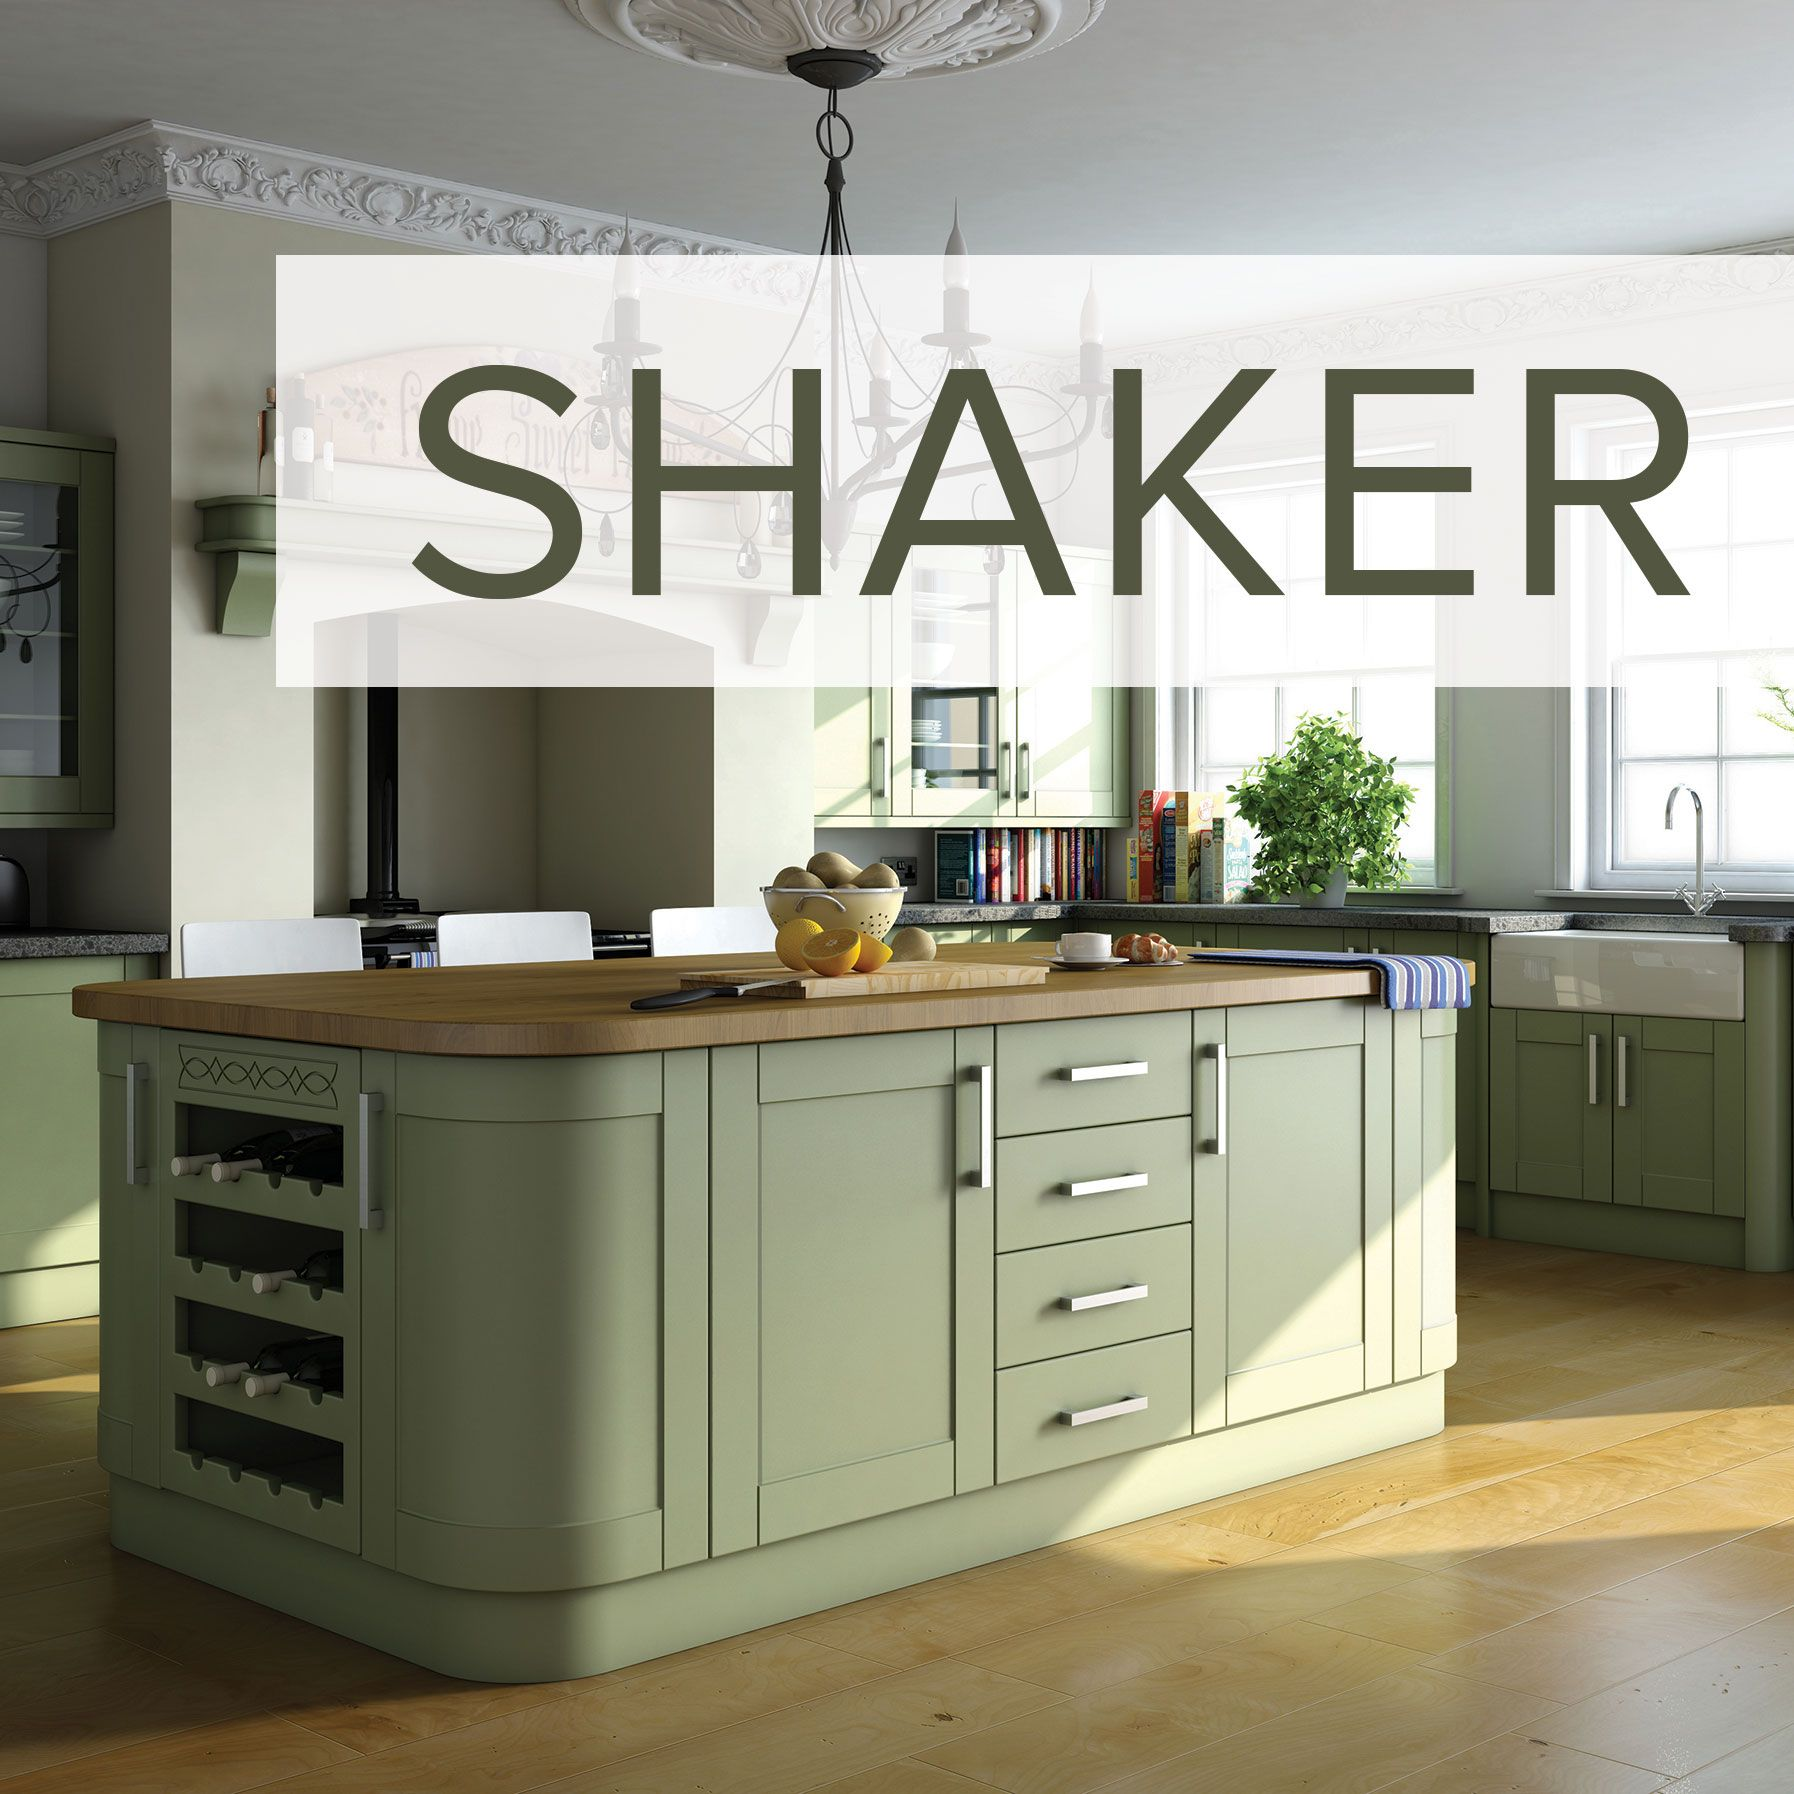 Heimwerker B Q Plum Style Shaker Replacement Kitchen Cupboards Doors Clearance Prices Turen Sg Com Jo